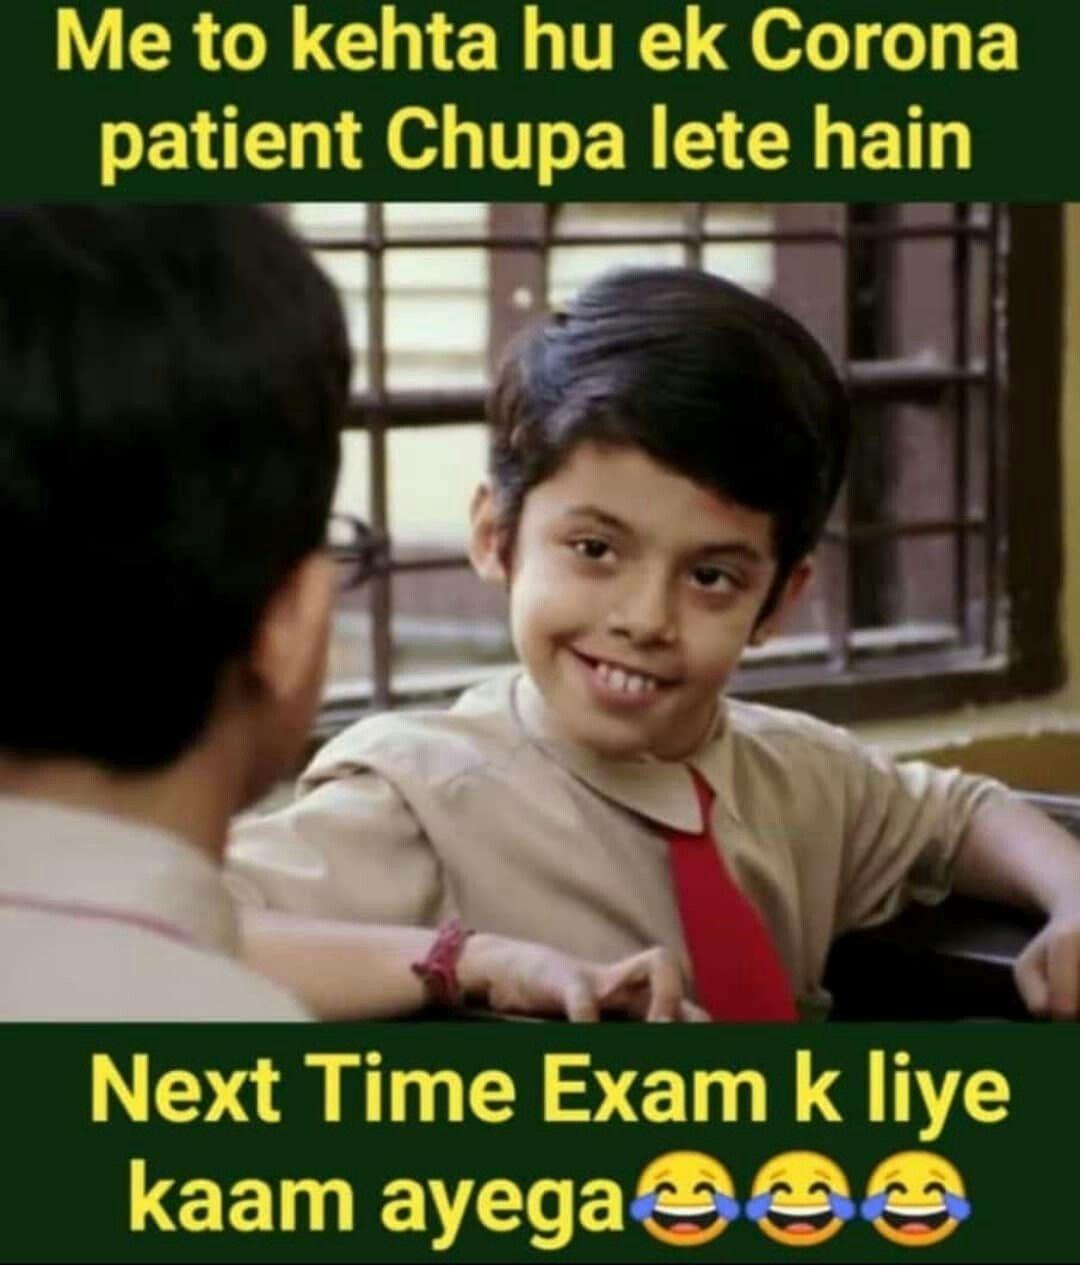 Pin By Jiya Bhalavi On Memes Funny Joke Quote Funny Study Quotes Funny Quotes For Instagram